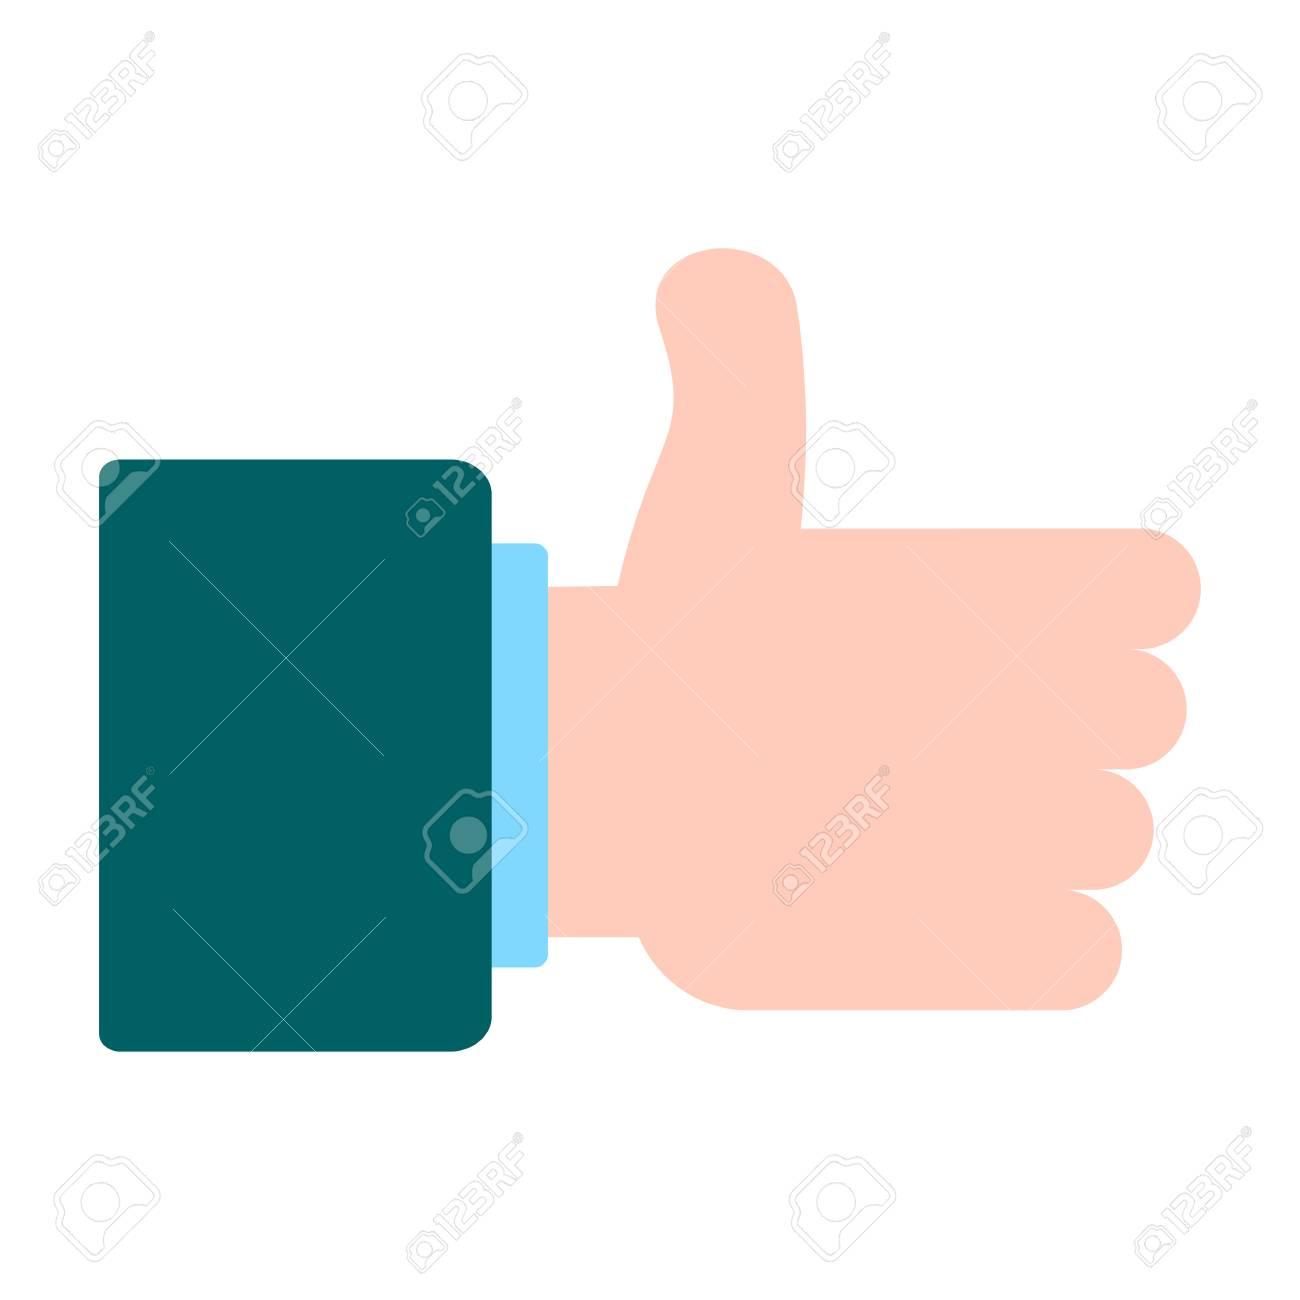 I Like Vector Sign Conceptual Symbol For Approval In Social Media